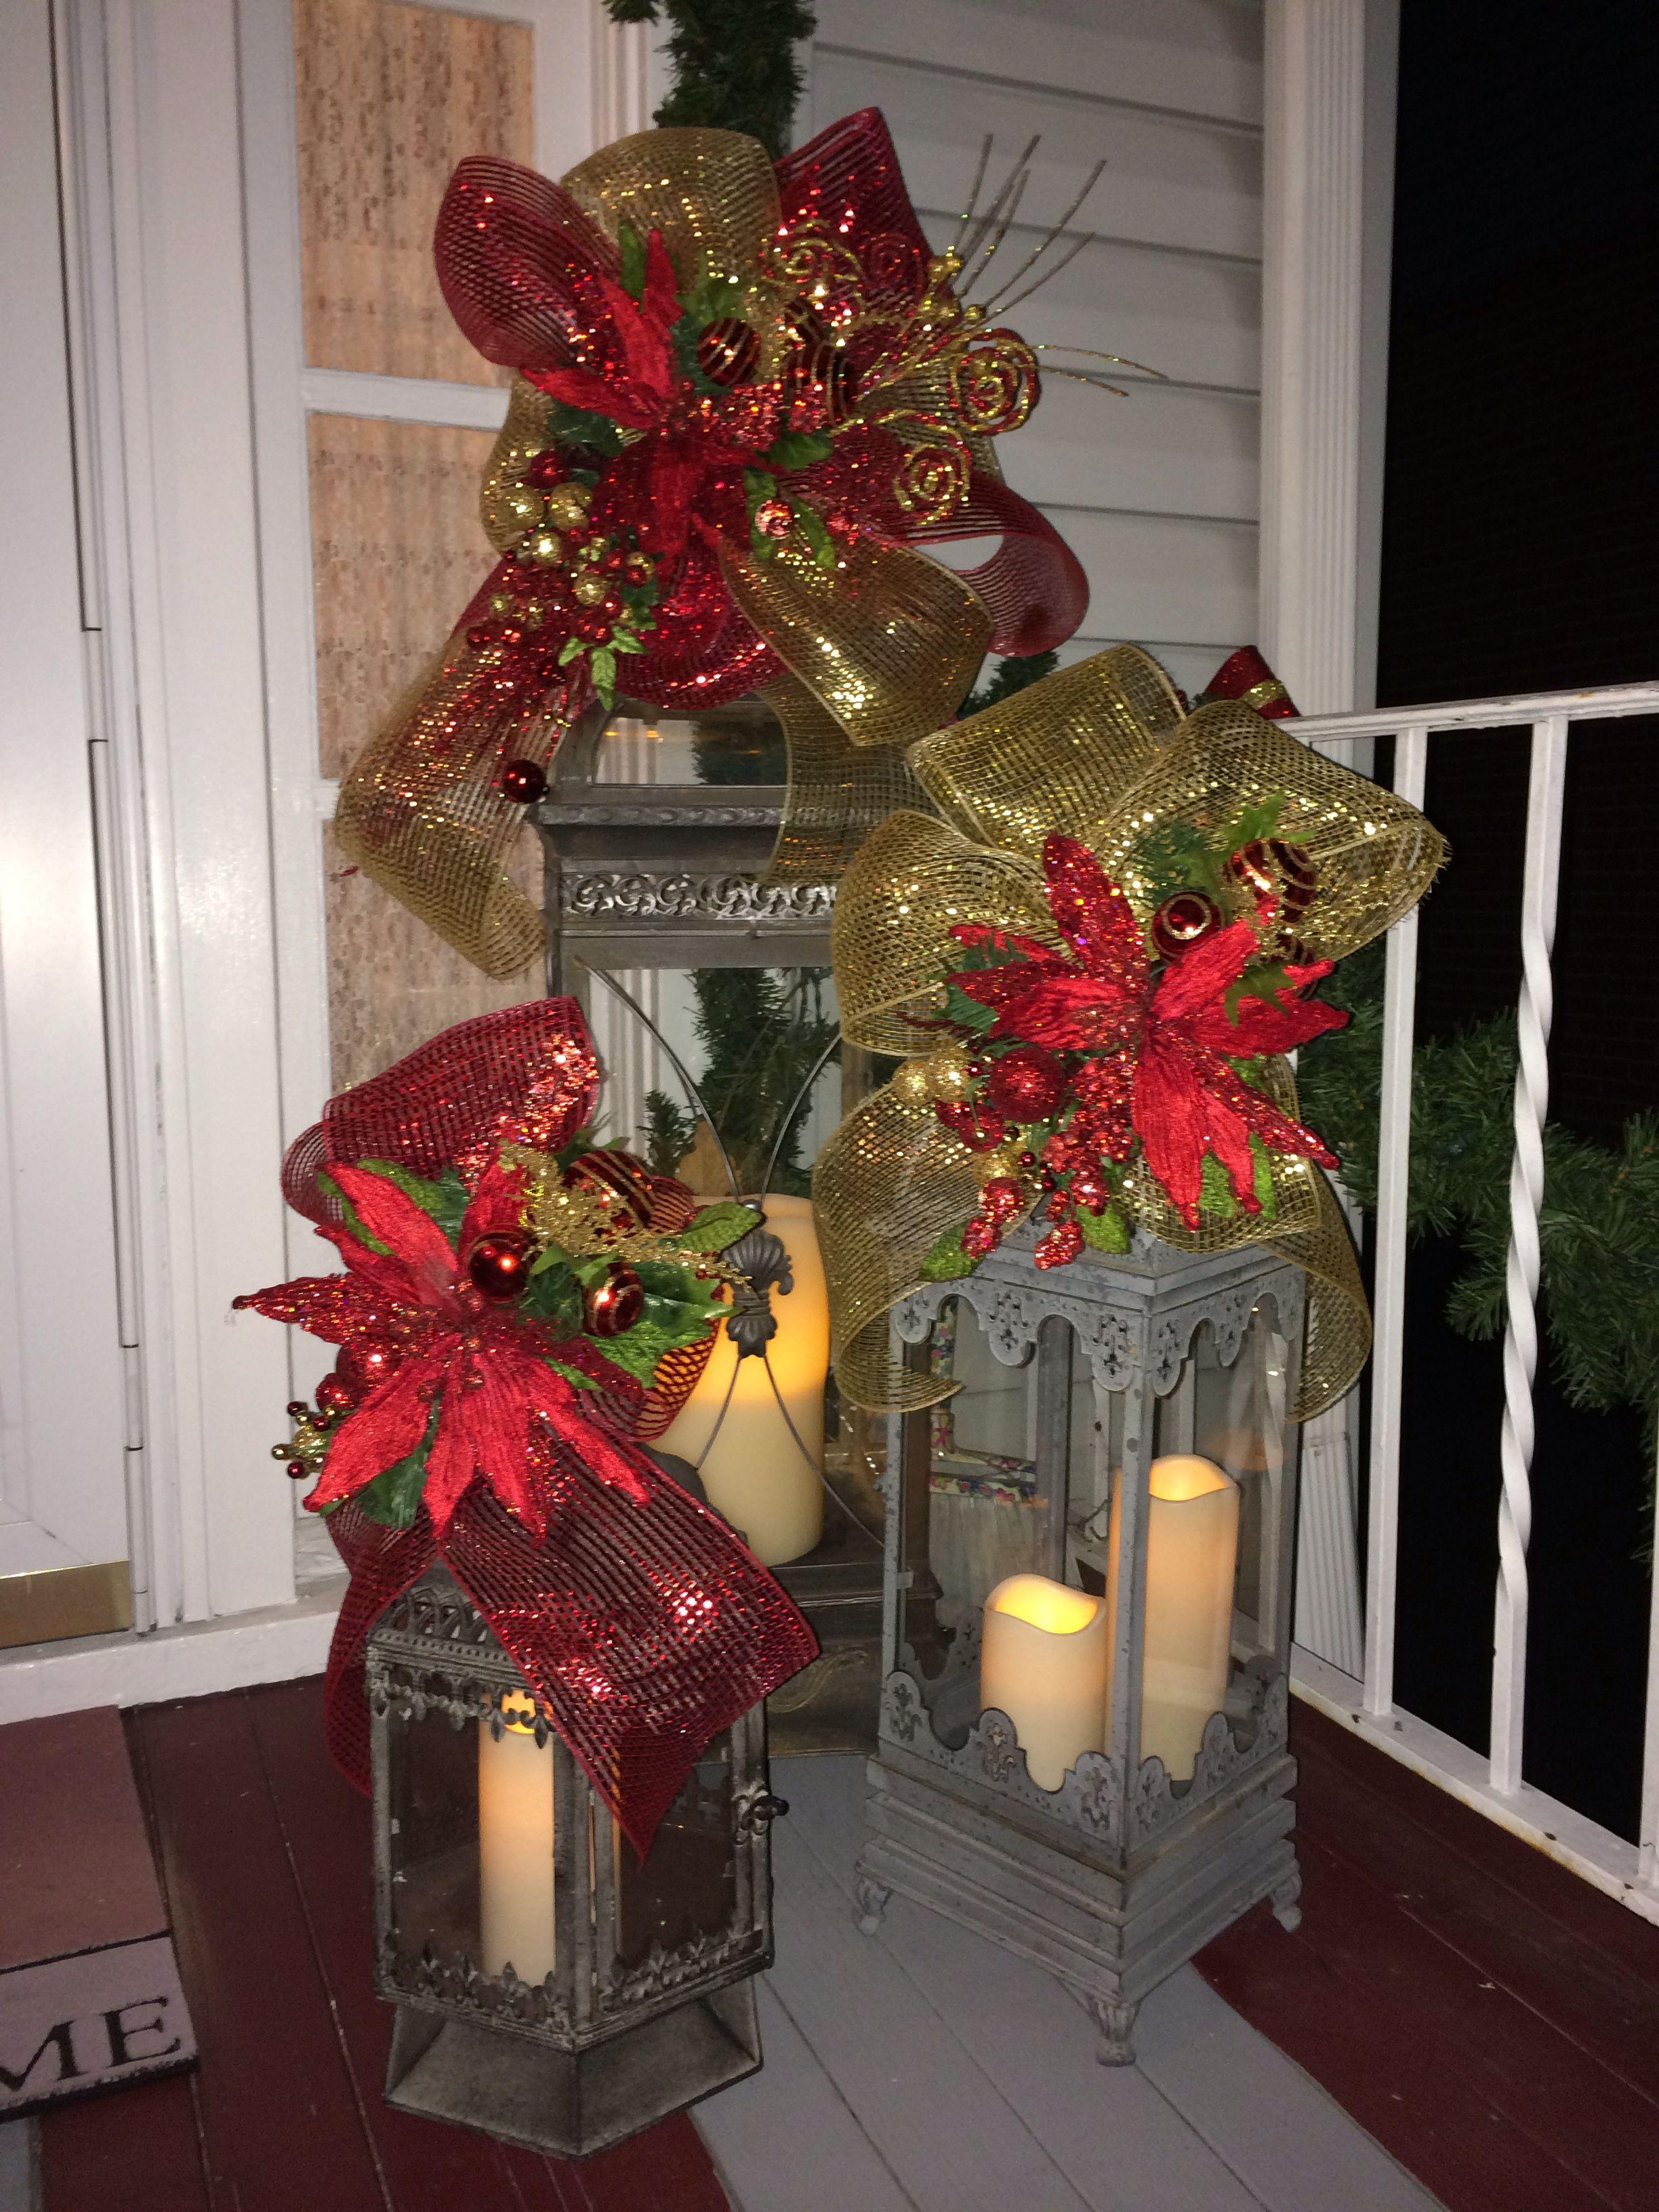 christmas lanterns laternen pinterest weihnachten laternen weihnachten und laternen. Black Bedroom Furniture Sets. Home Design Ideas